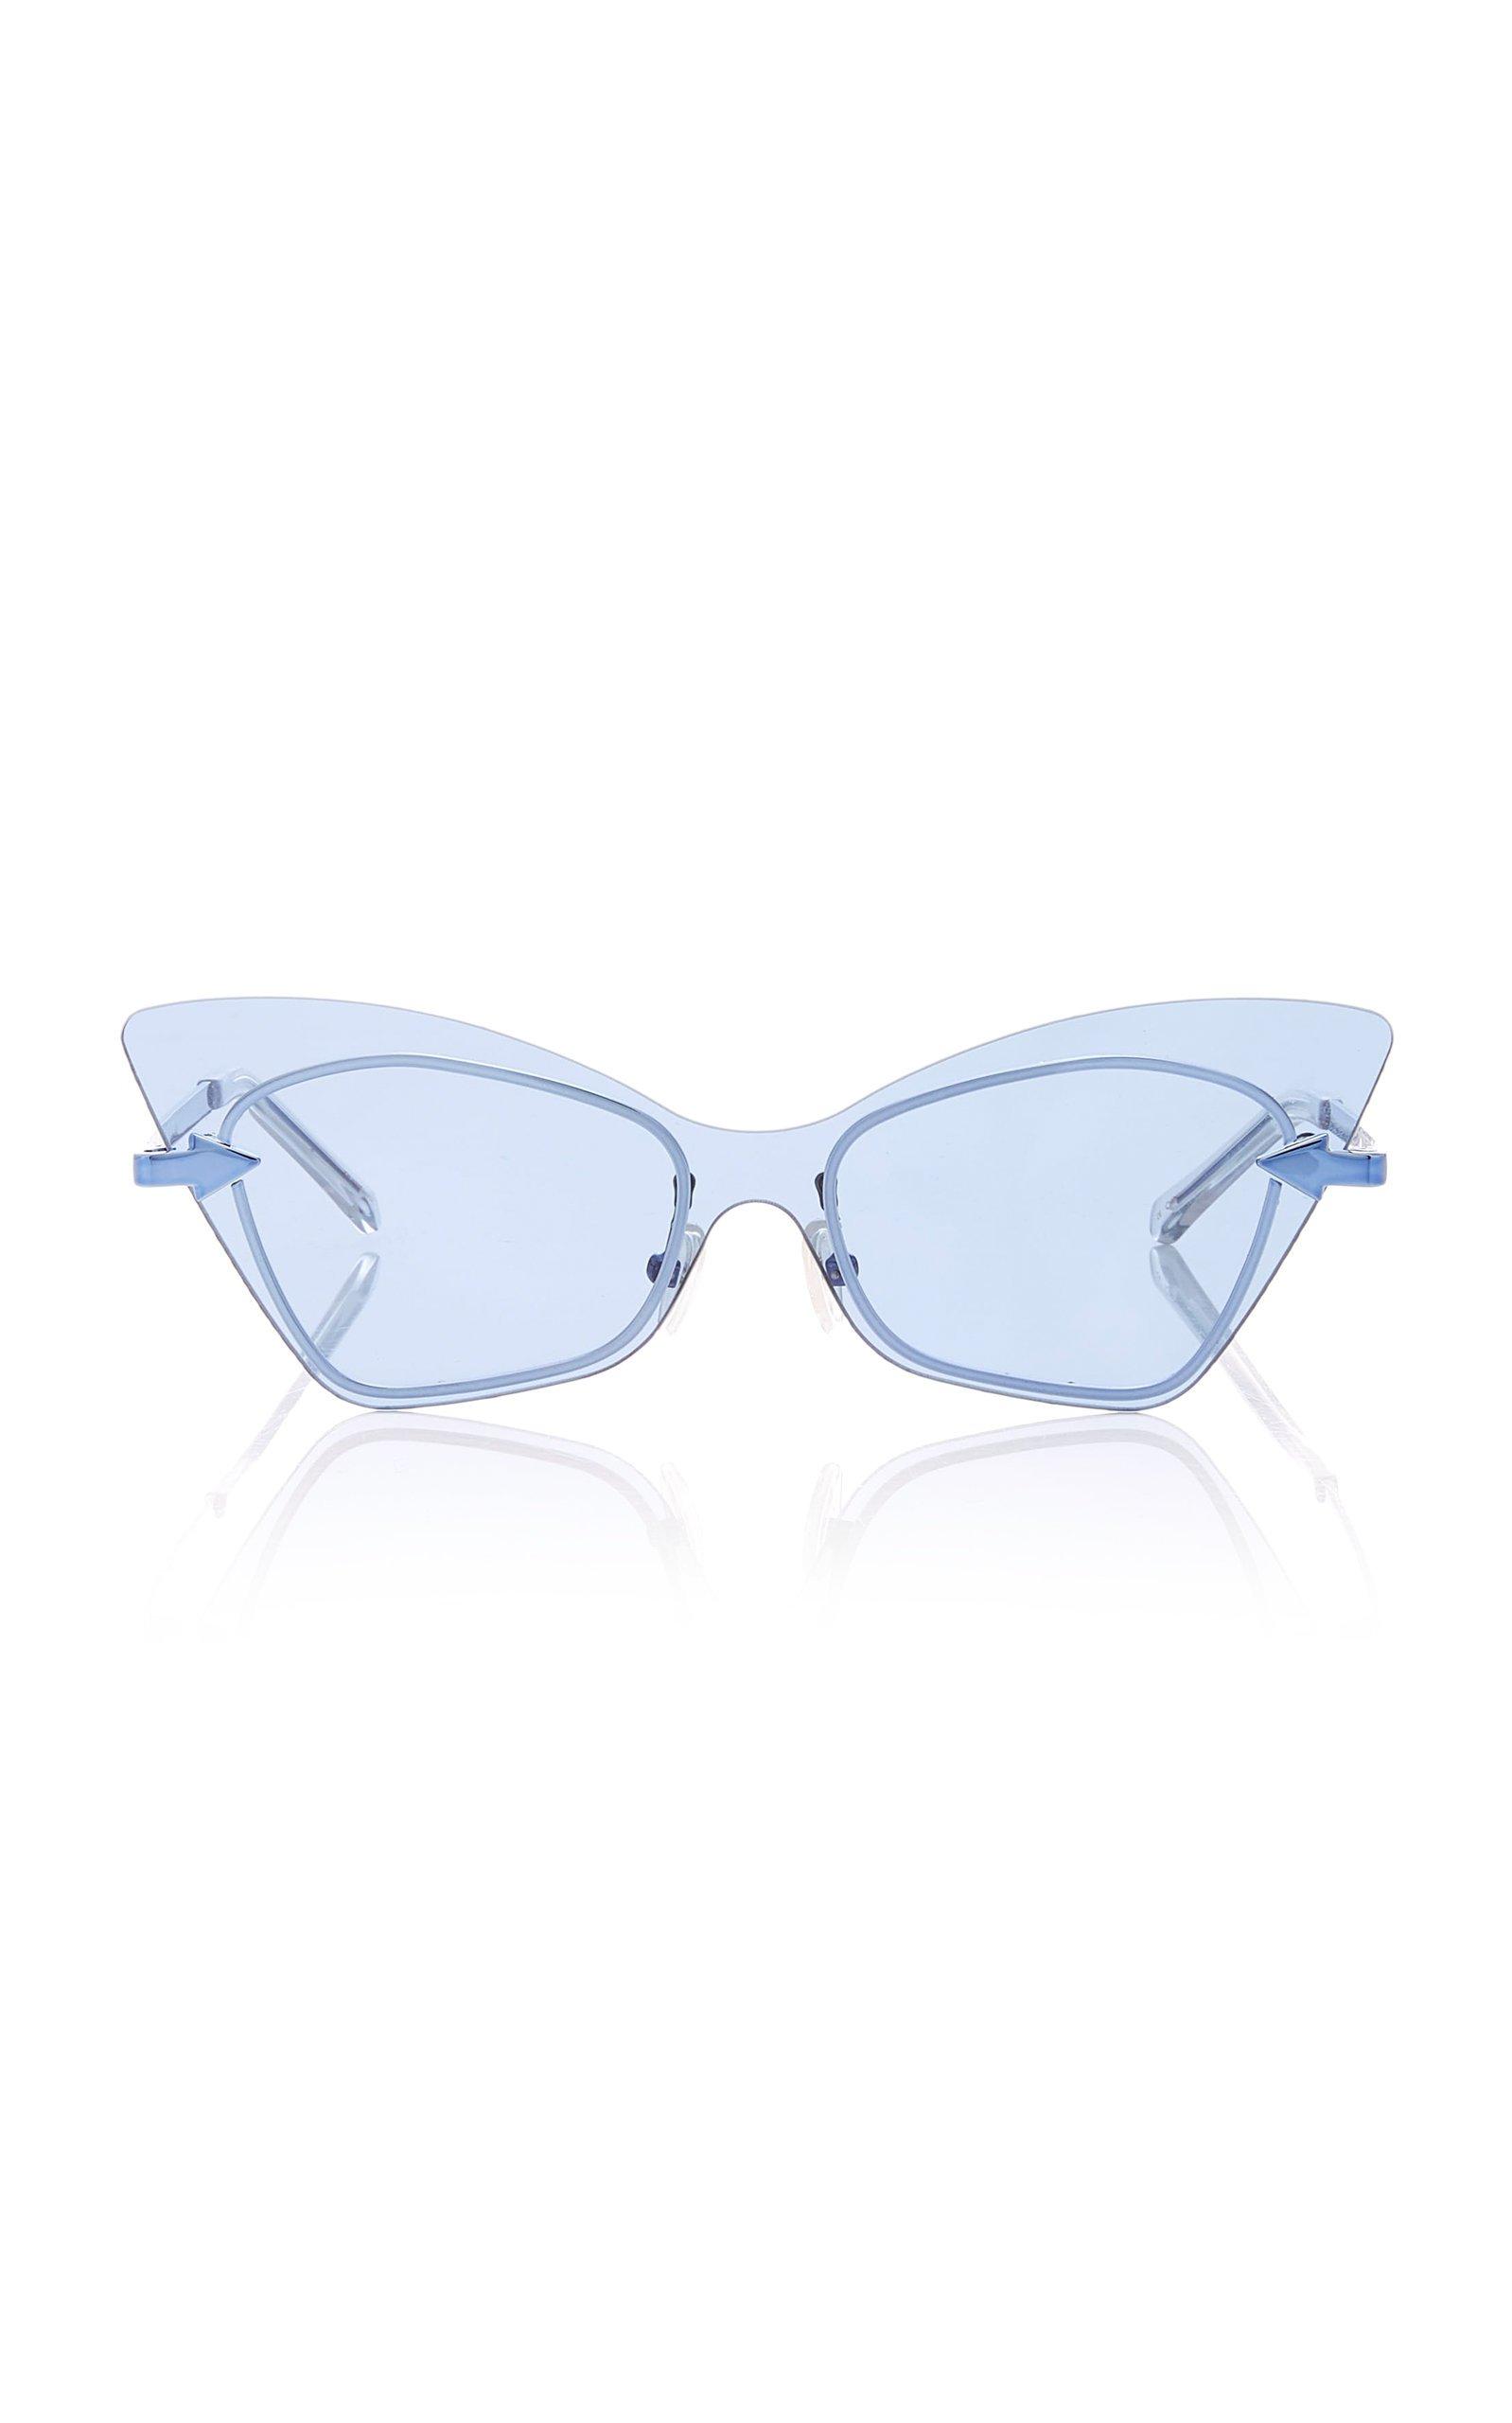 Mrs Brill Cat Eye Acetate Sunglasses by Karen Walker | Moda Operandi